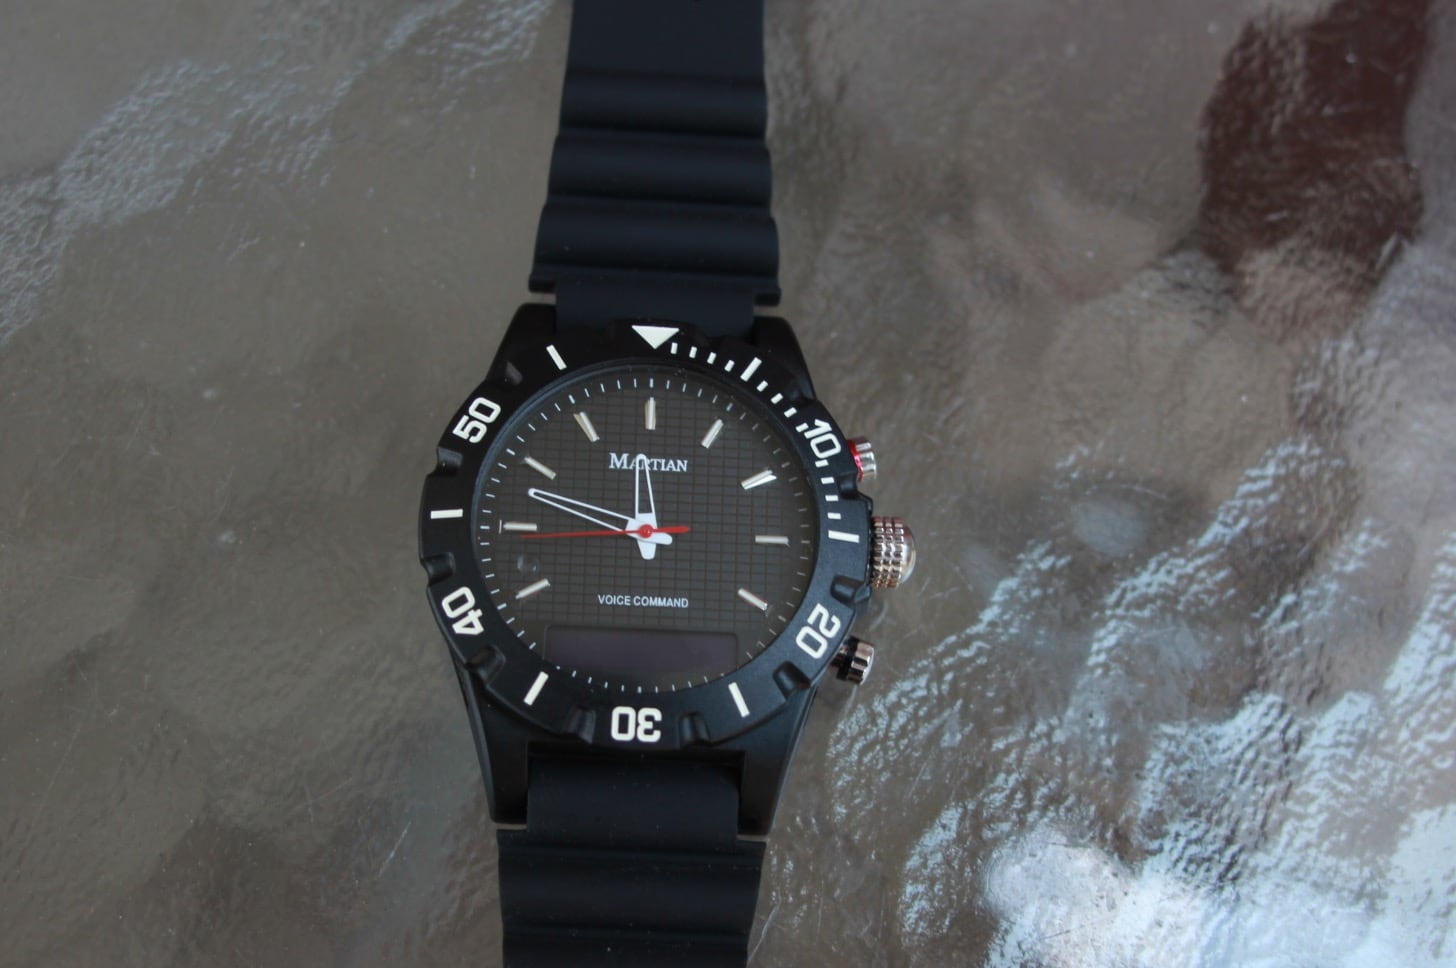 martian smartwatch 1